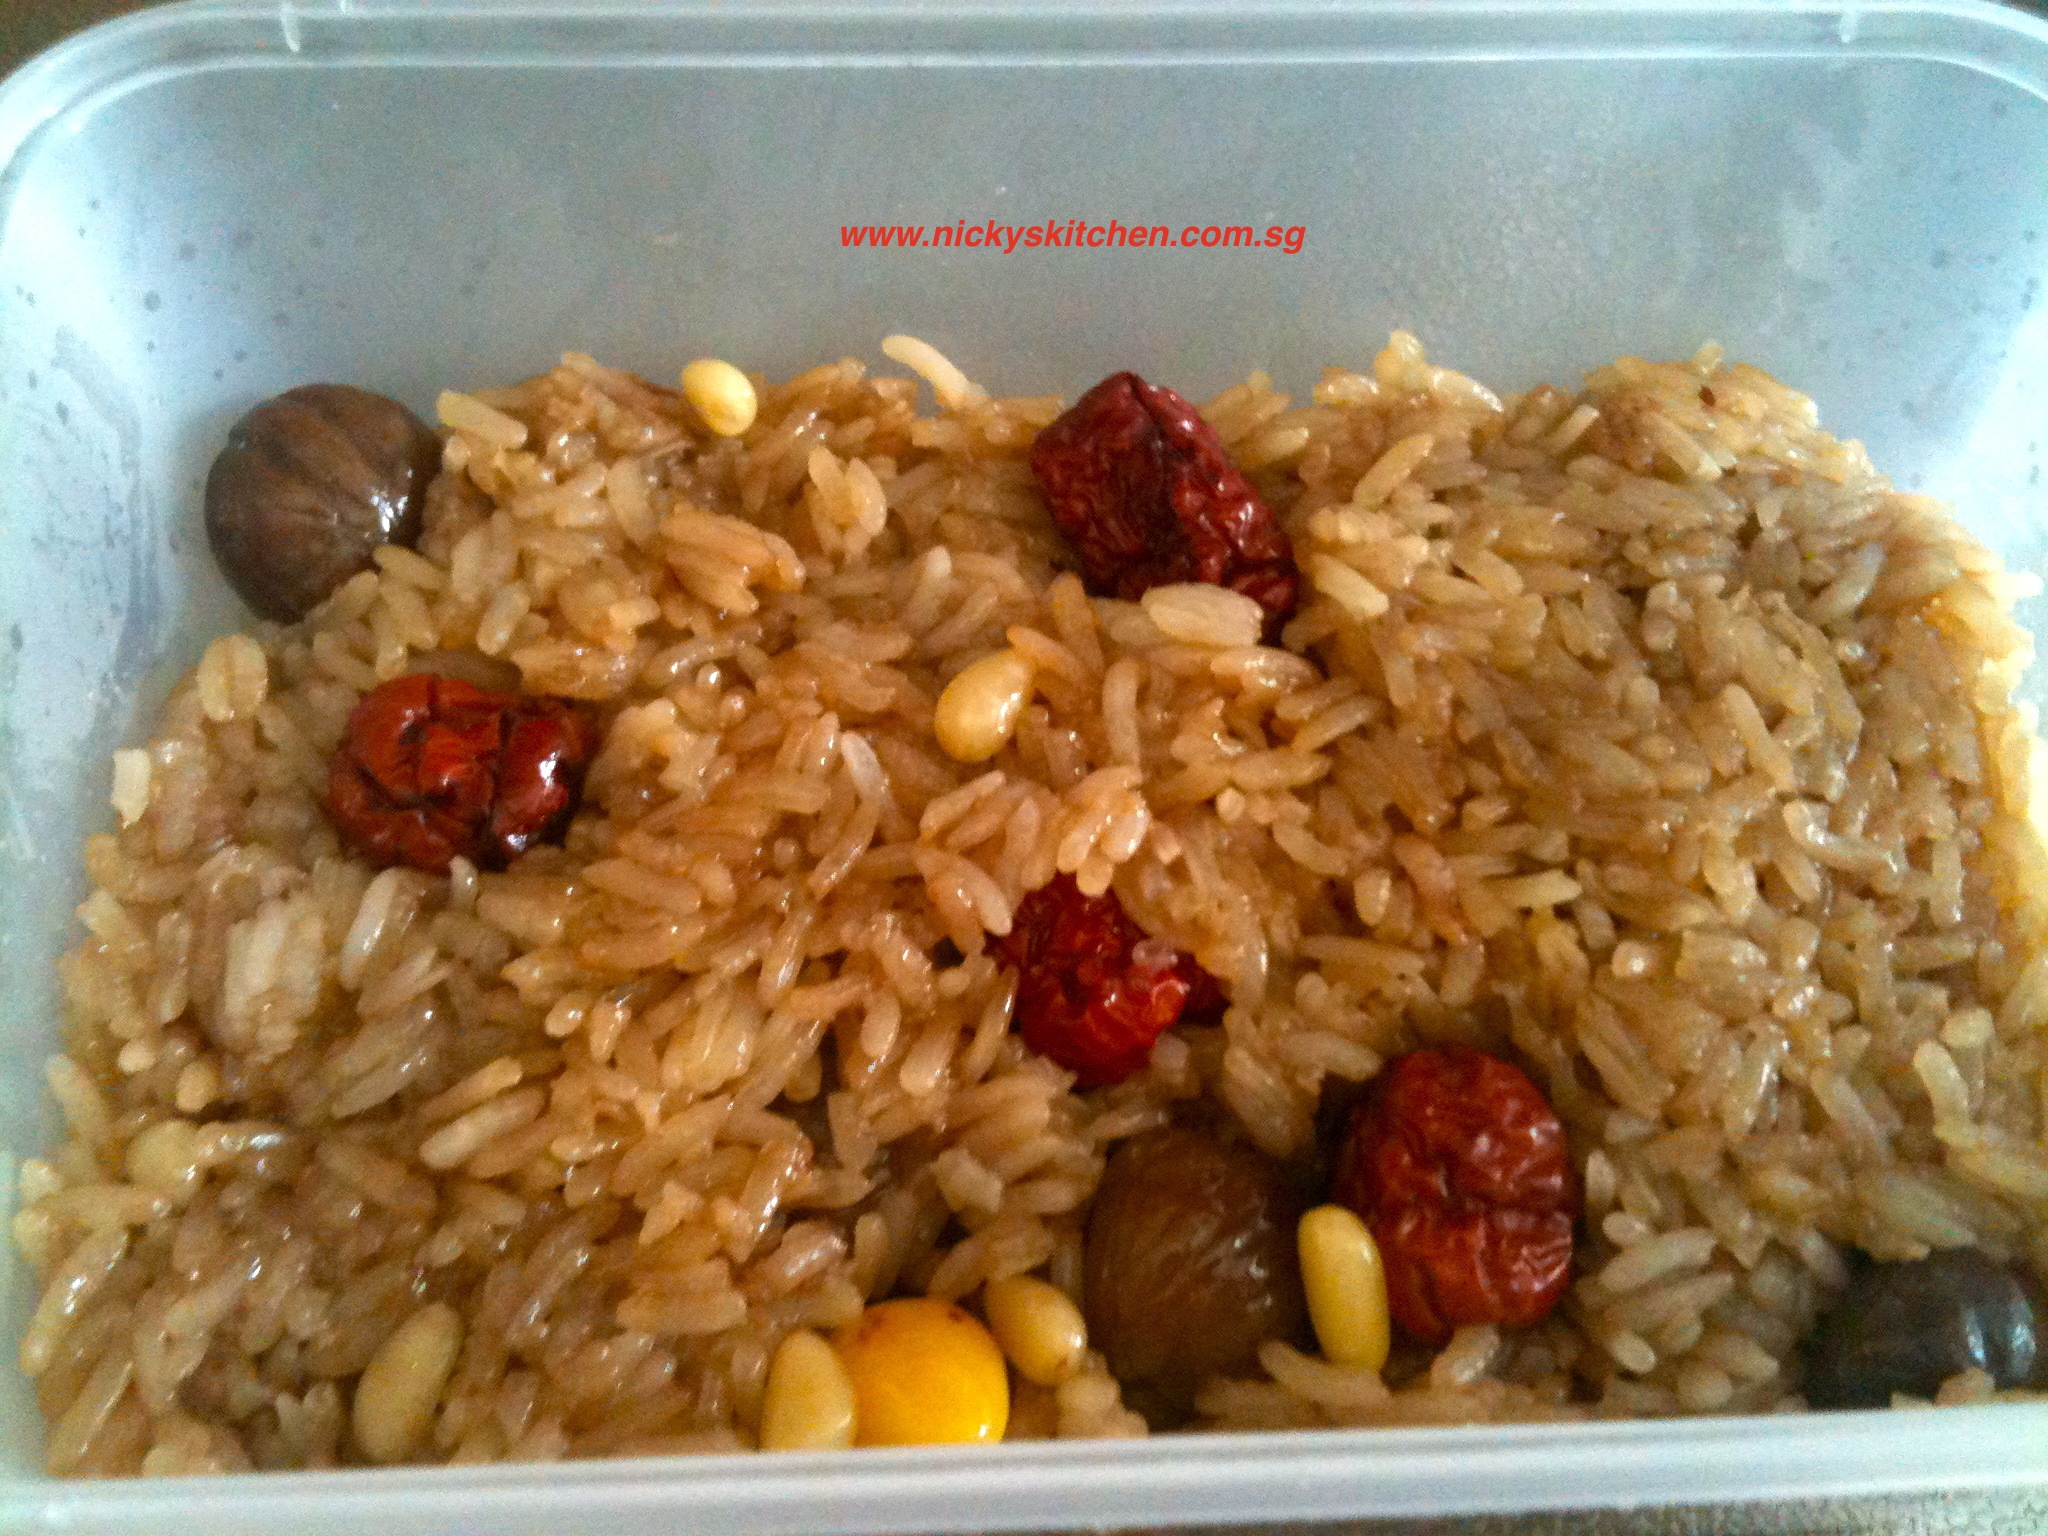 Rice cake – Yak shik (약식)